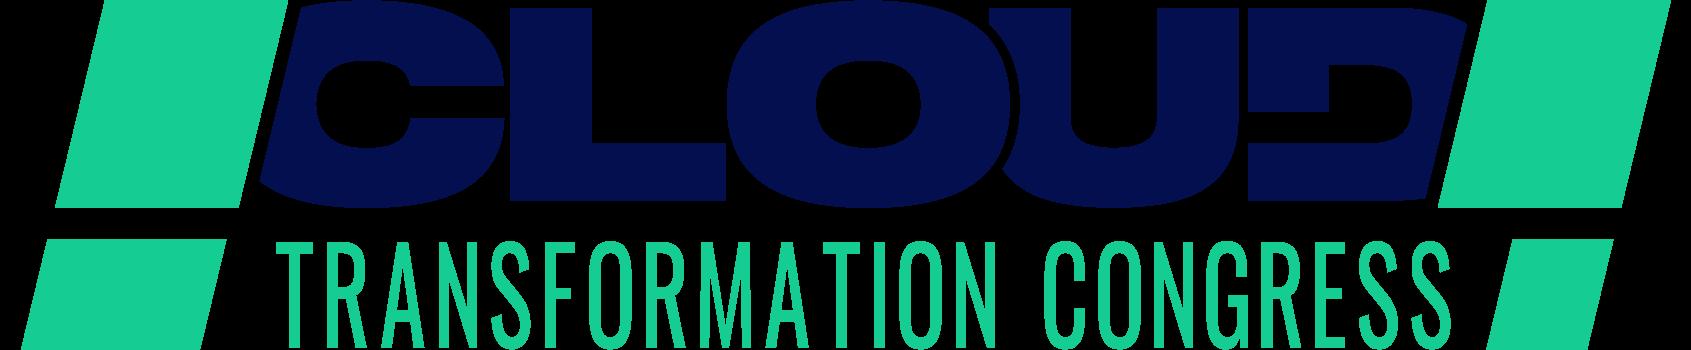 Cloud Transformation Congress